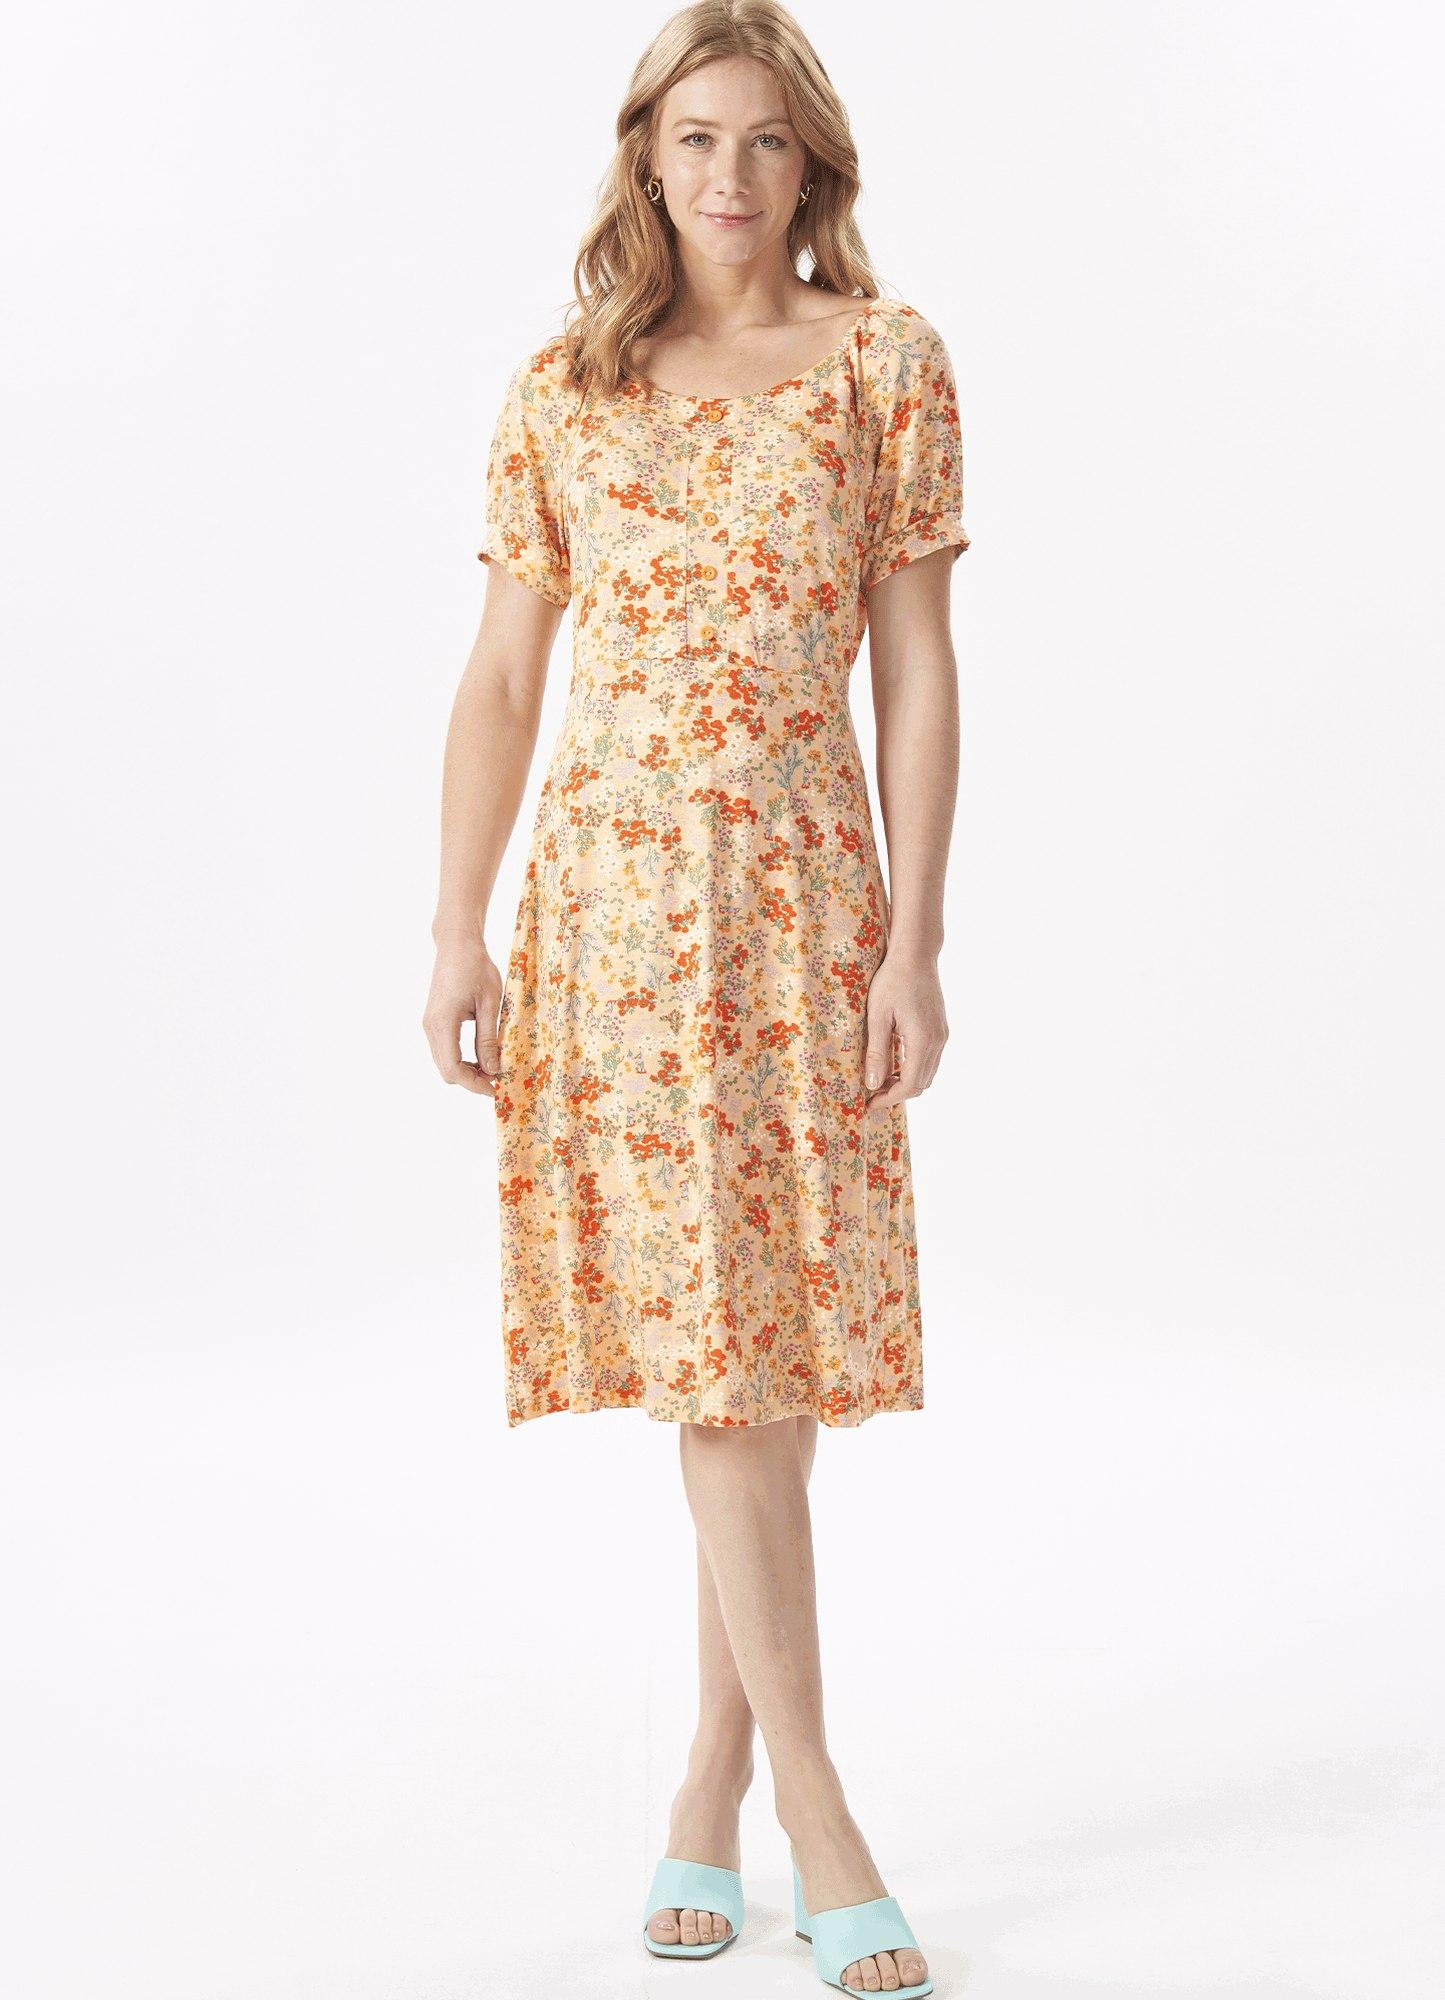 Vestido Feminino Plus Size Bata Malha Estampado Liberty Botões